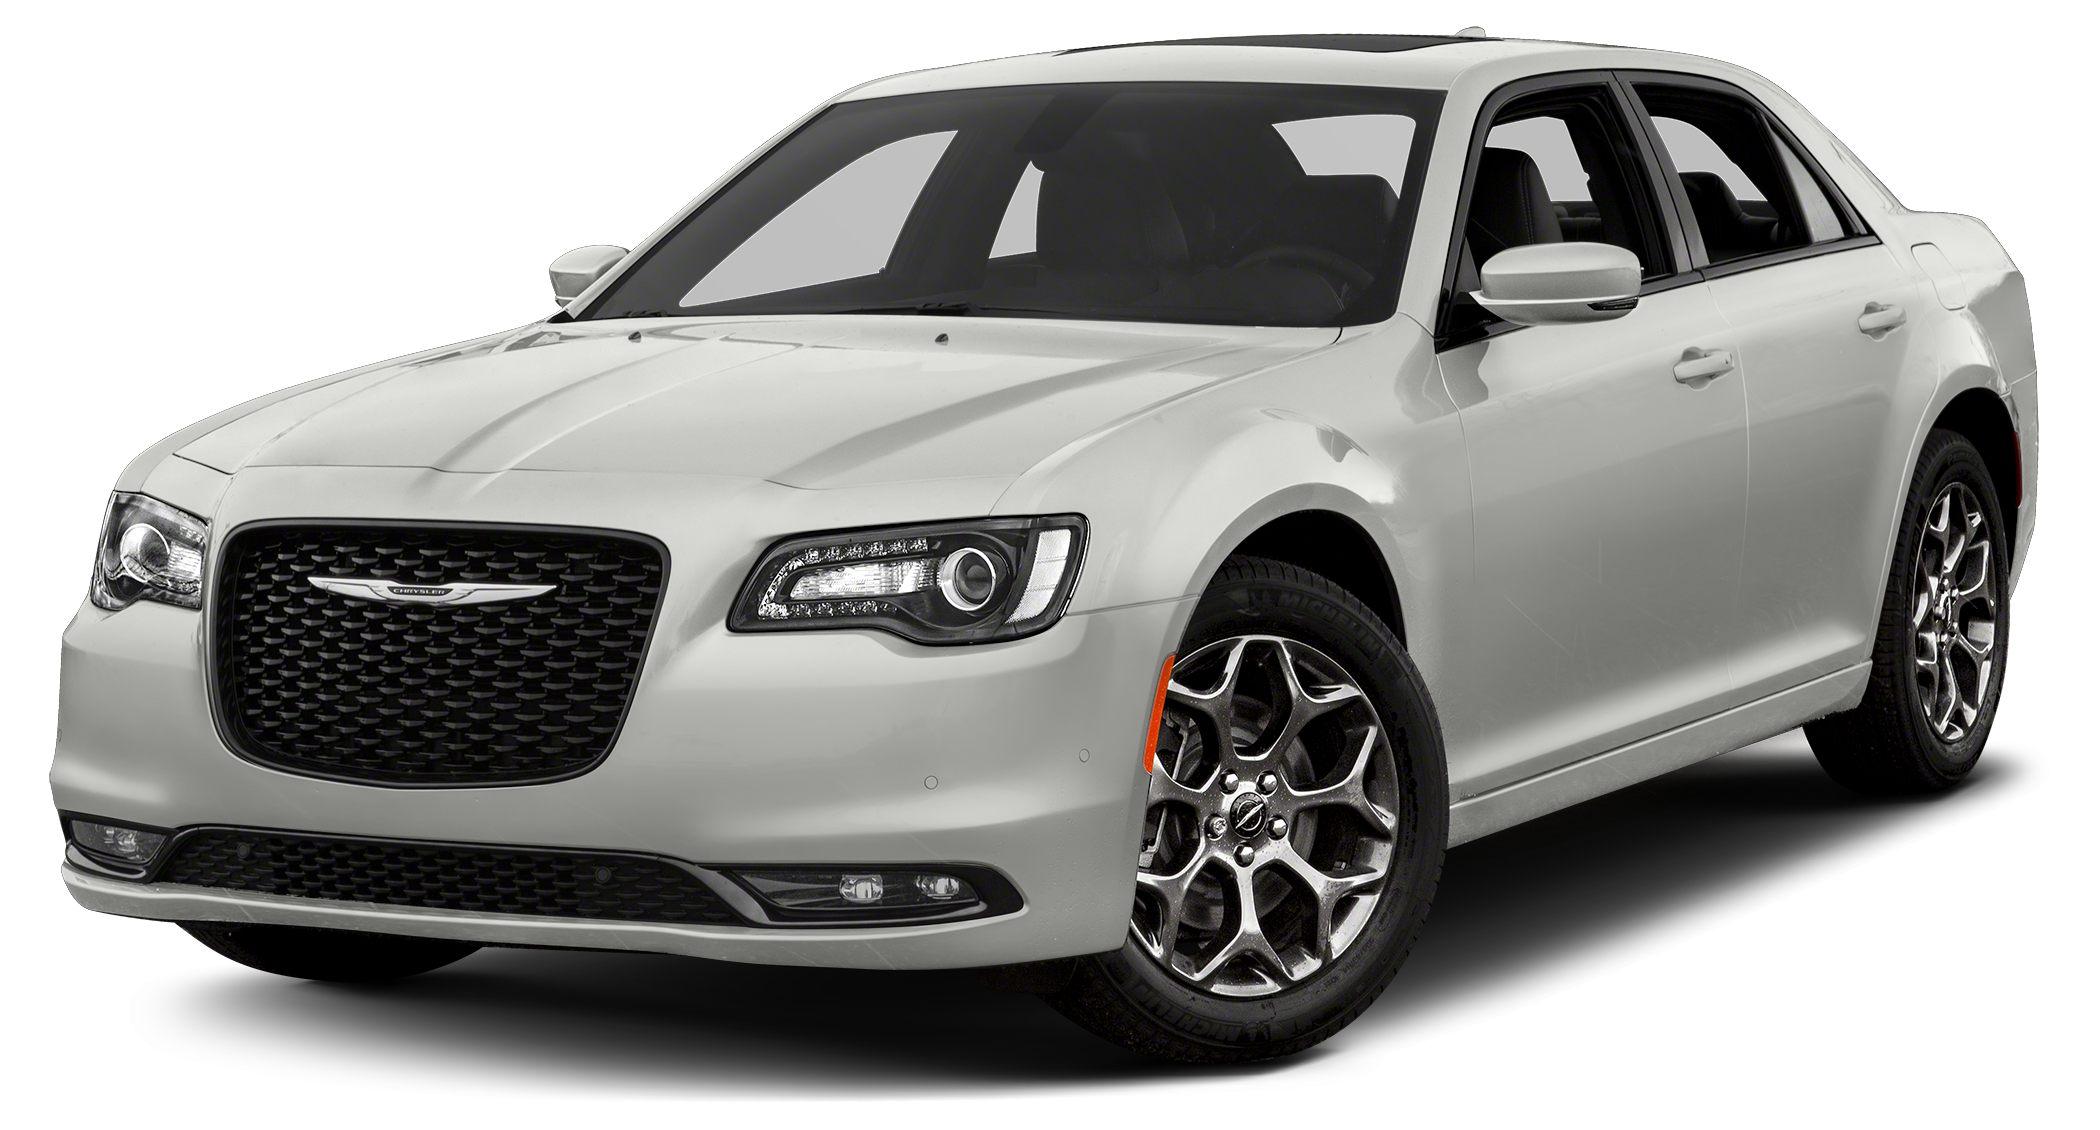 2015 Chrysler 300 S Miles 18052Color Ivory Tri-Coat Pearl Stock P7036 VIN 2C3CCABG9FH736030